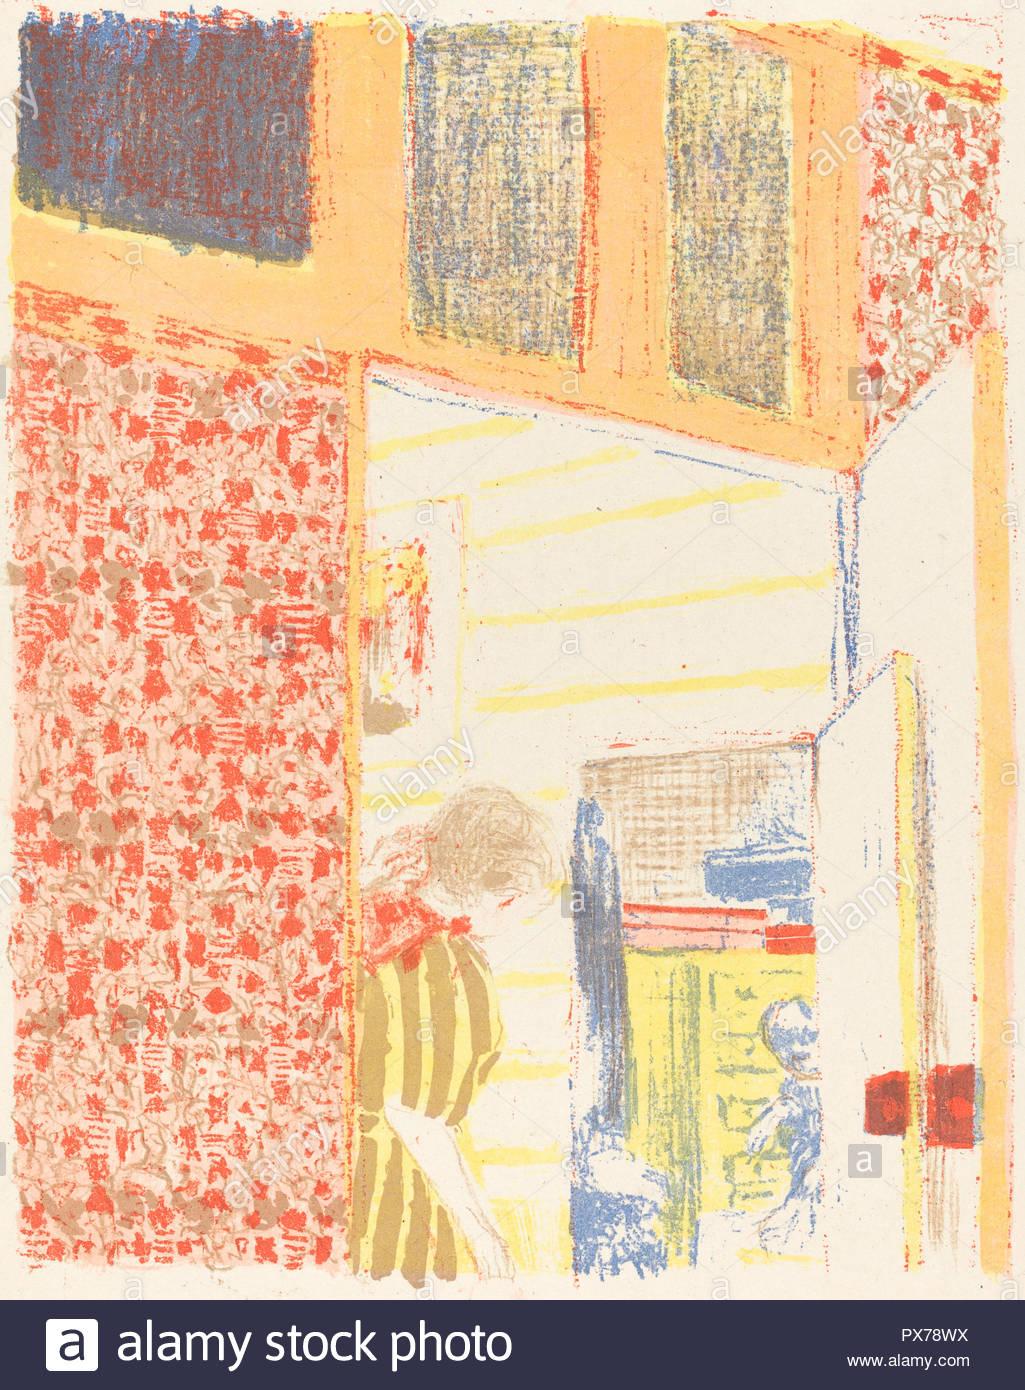 Interieur mit rosa Tapete II (Interieur aux tentures Roses II). Vom: C. 1896 (veröffentlicht 1899). Medium: farblithographie auf China Papier. Museum: Nationalgalerie, Washington DC. Autor: Edouard Vuillard. Stockbild